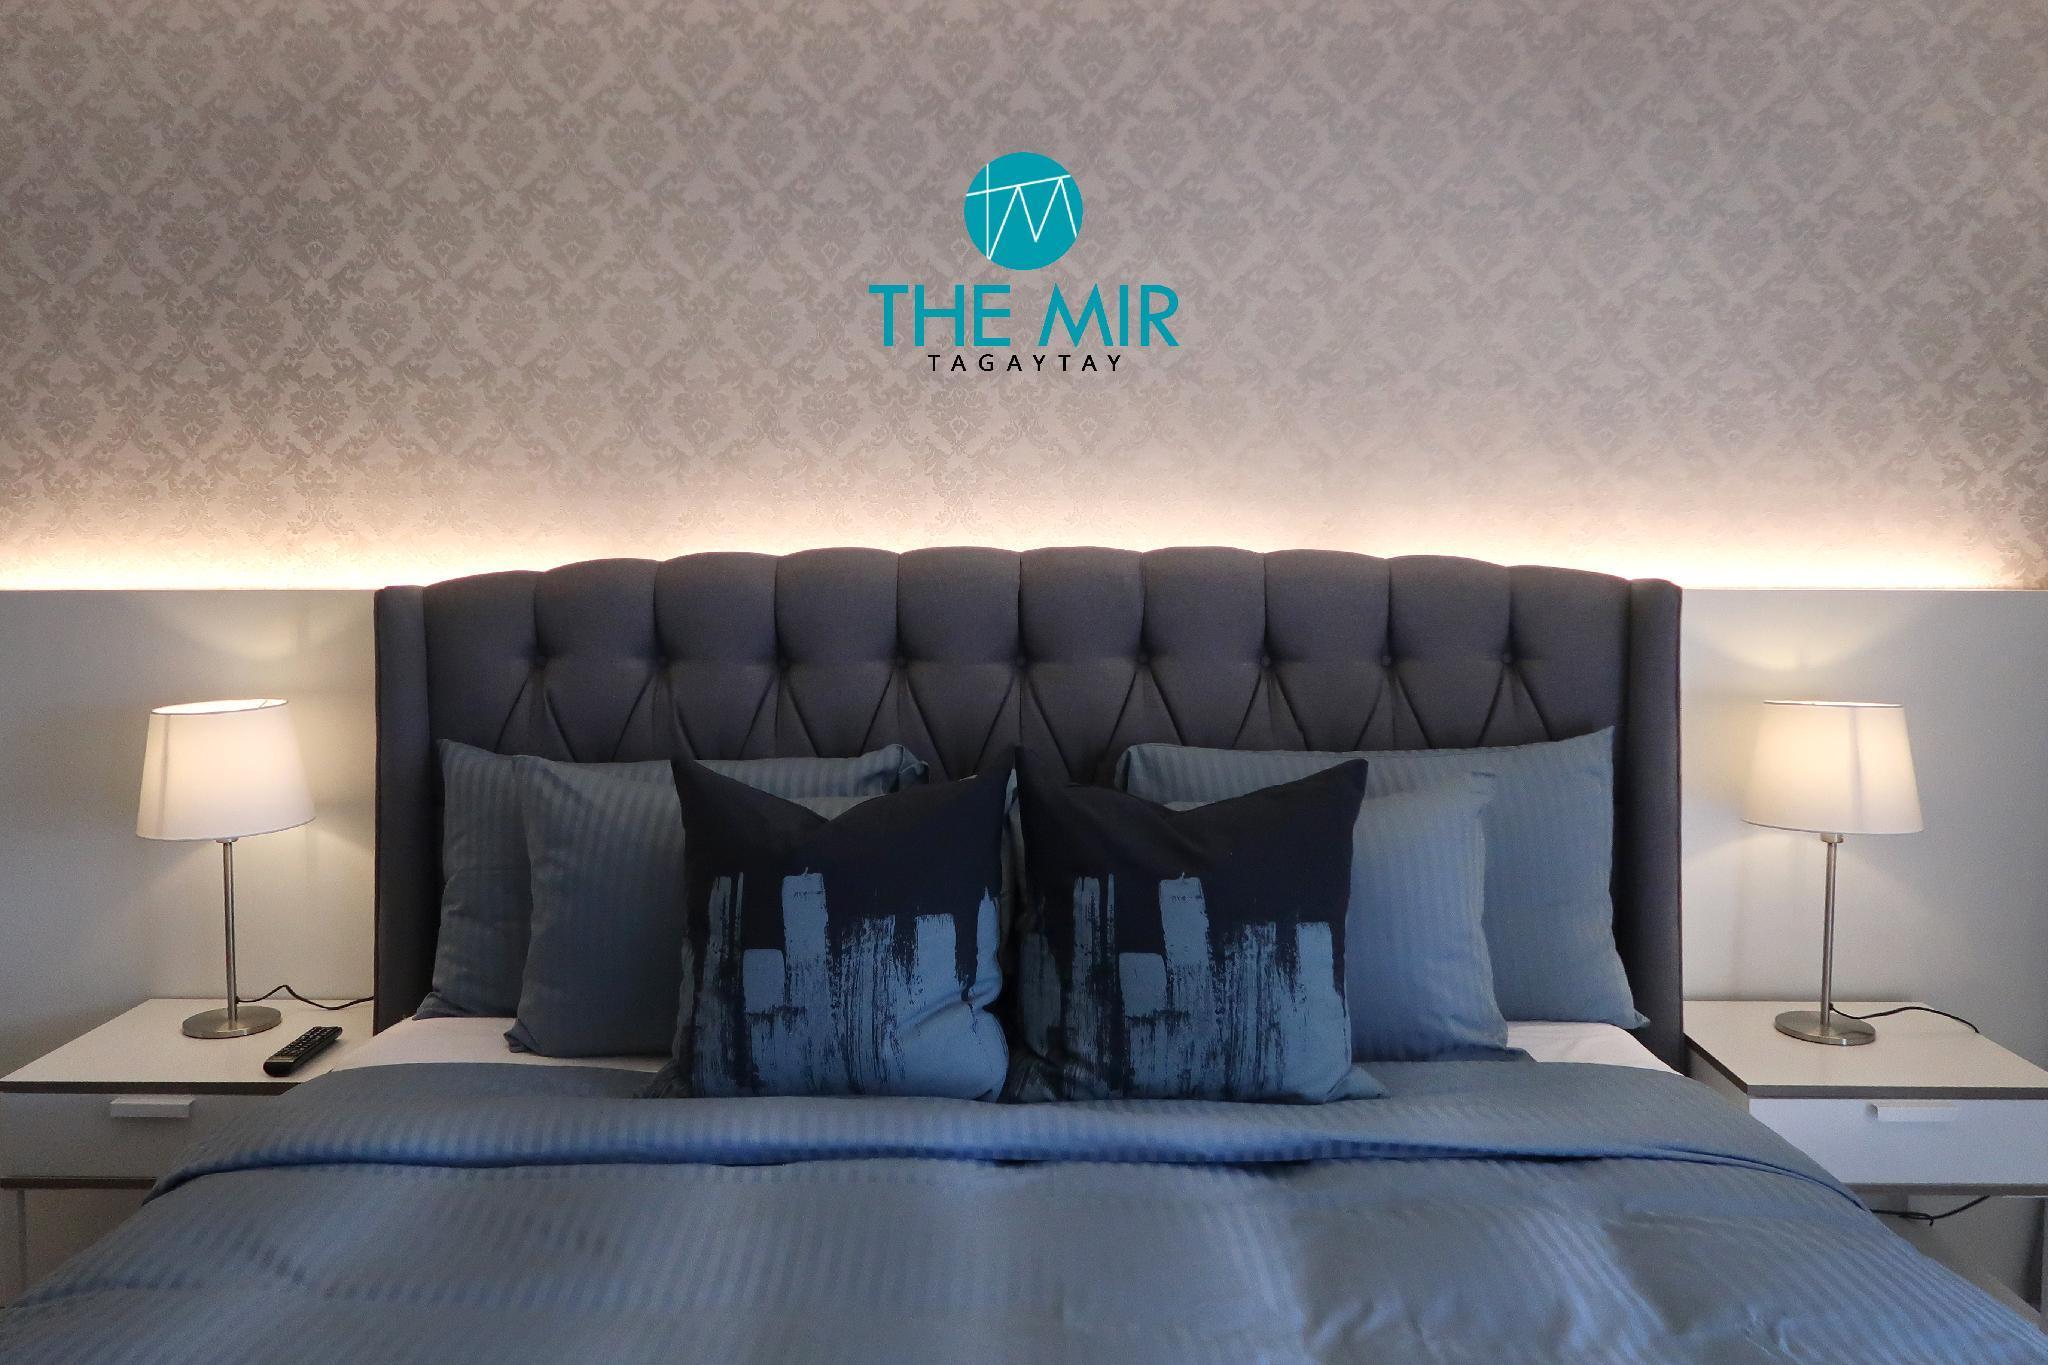 NEW Luxury Condo in Tagaytay! With Fibr & Netflix!